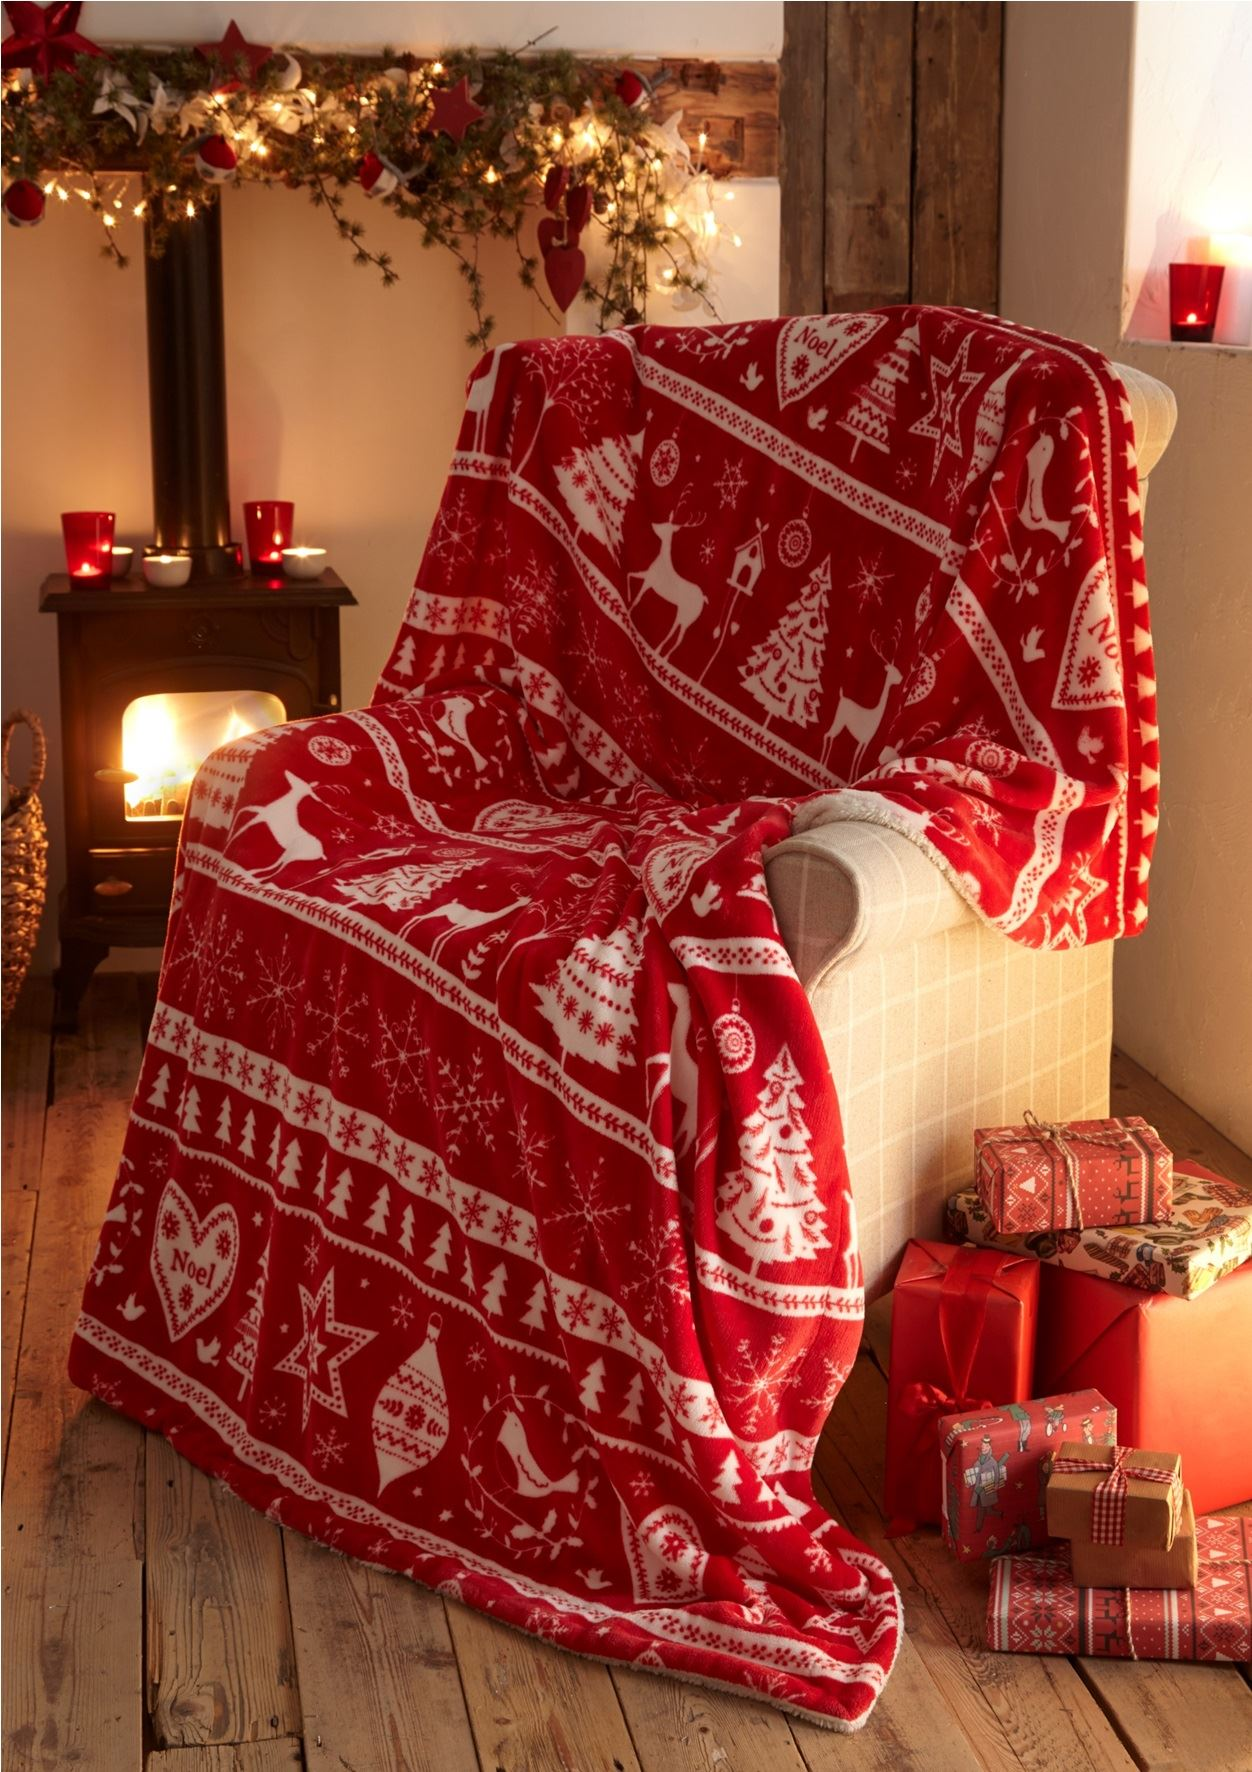 Christmas Soft Fleece Throws Decorative Bed Sofa Blanket